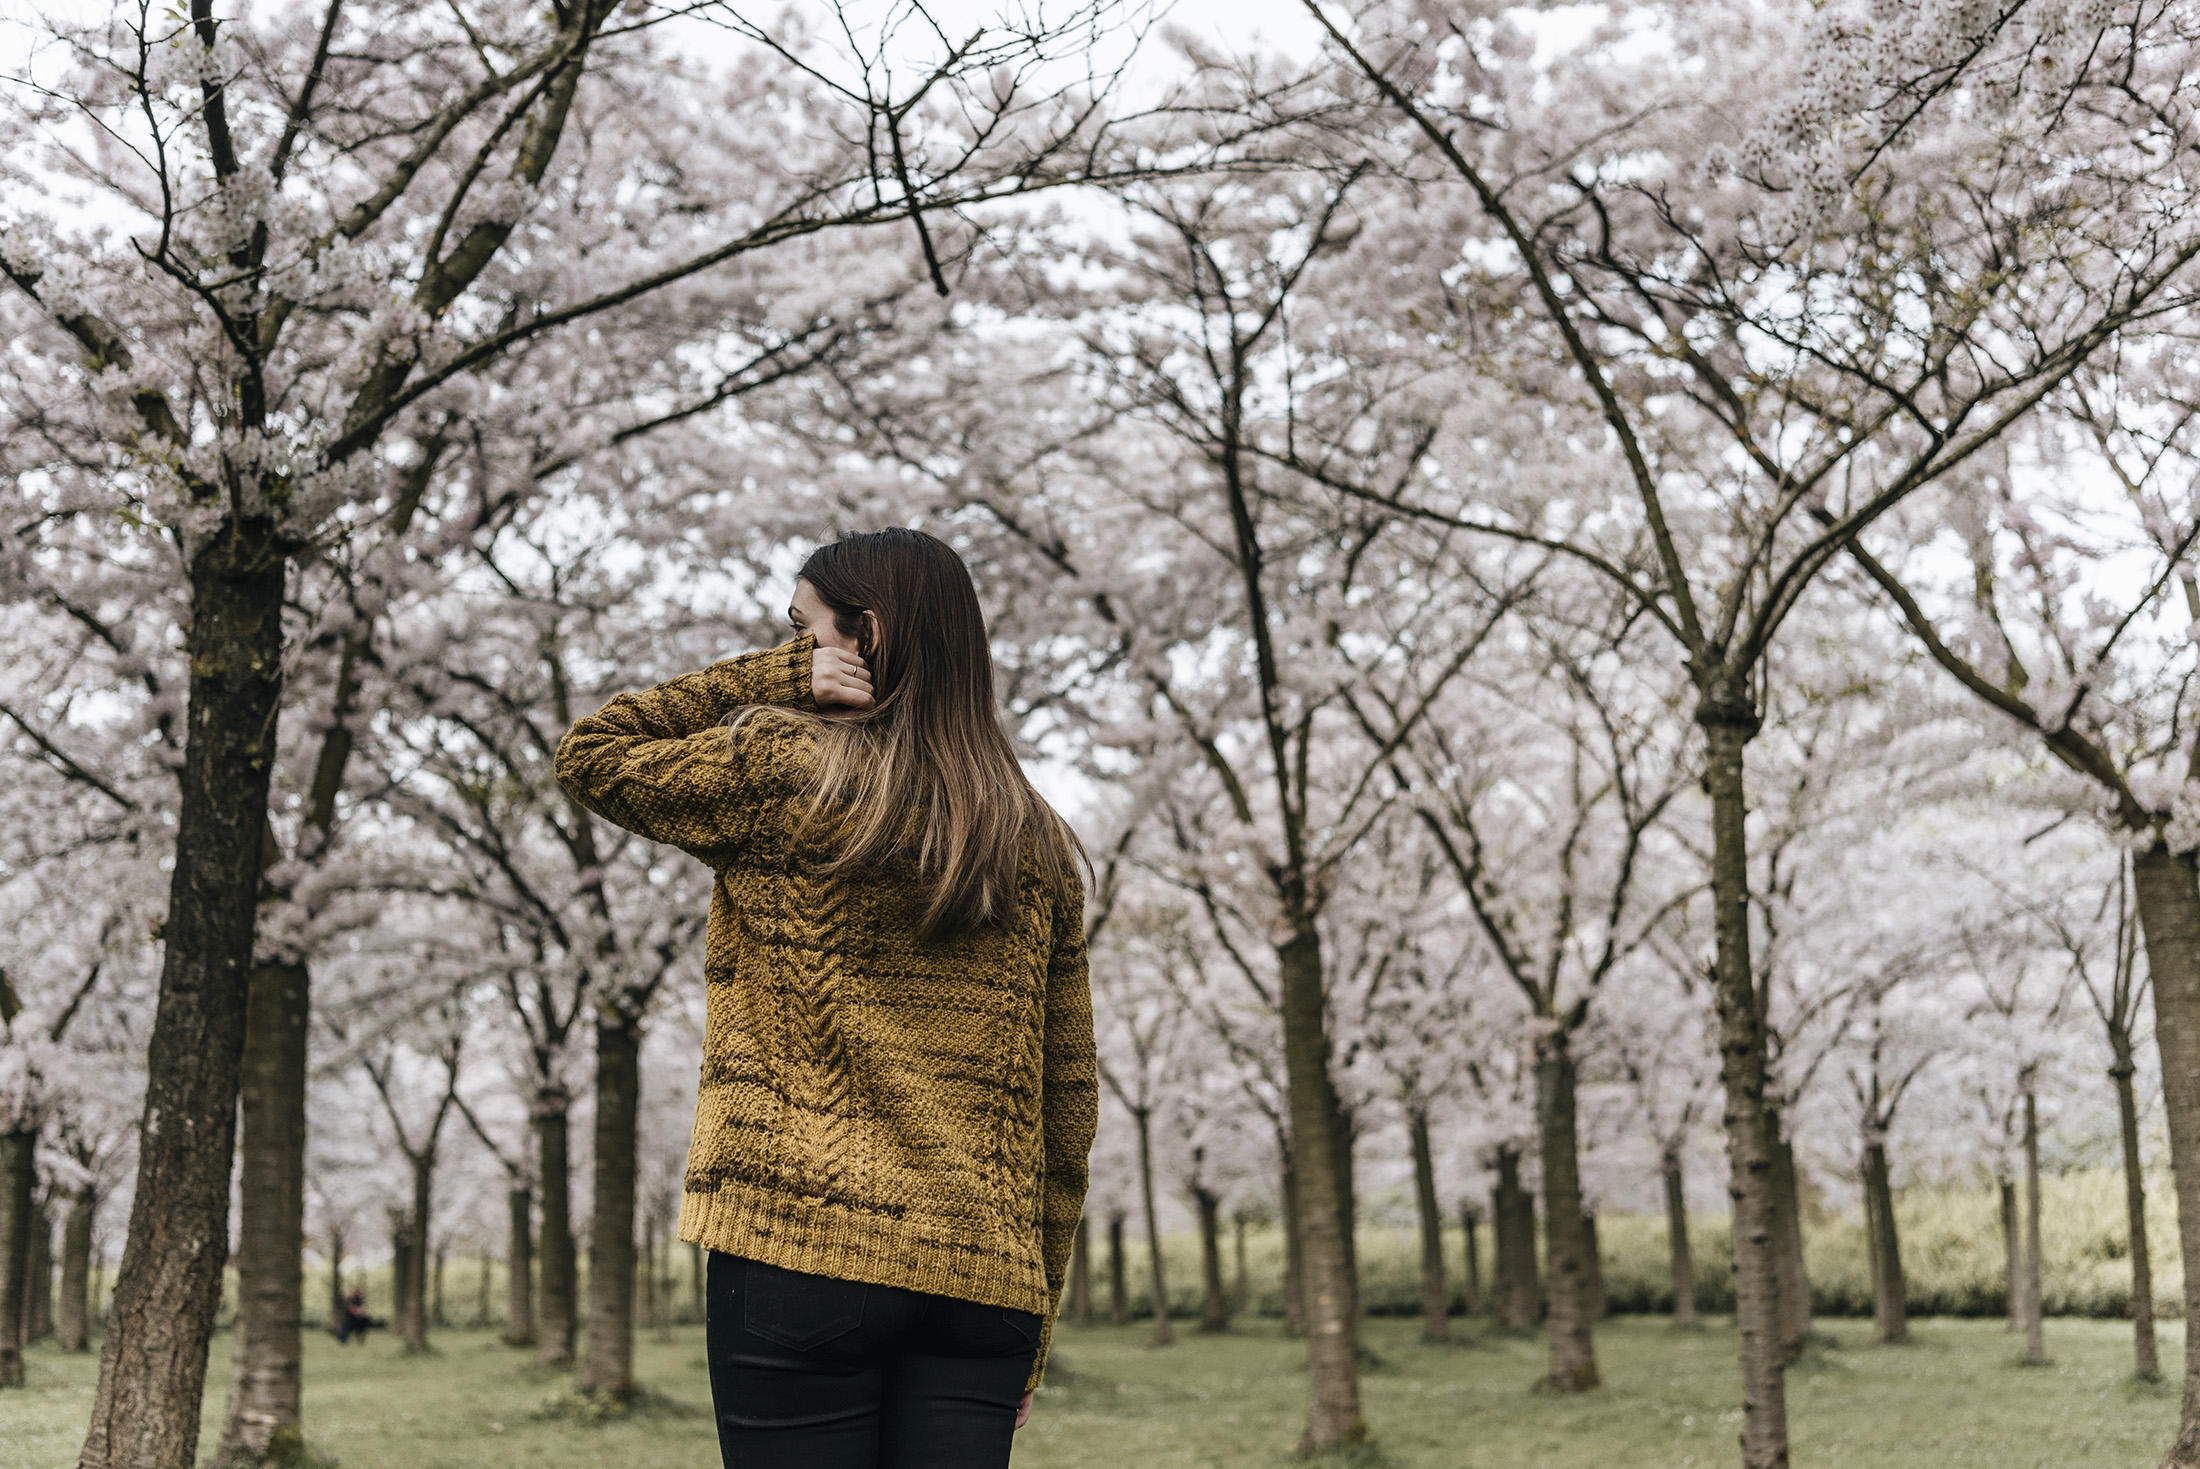 portrait hanami sakura cherry blossom spring